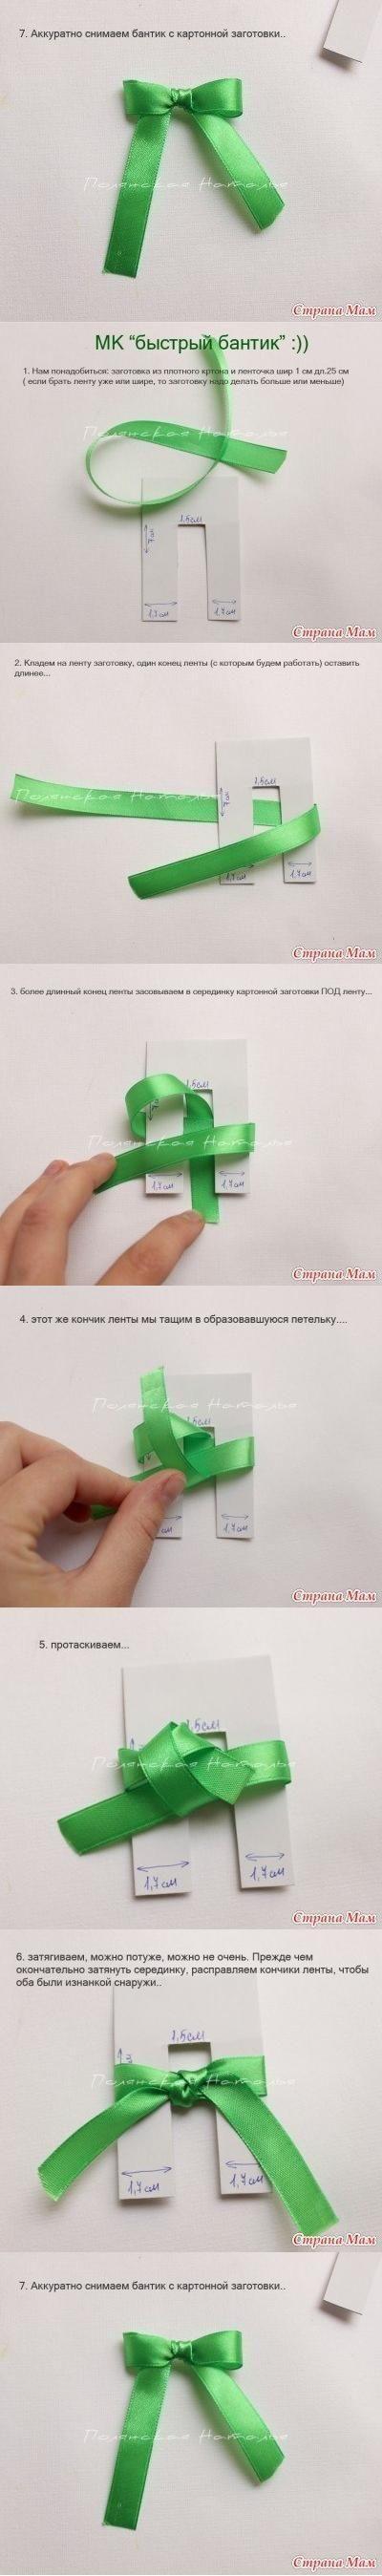 DIY Ribbon Bow Craft